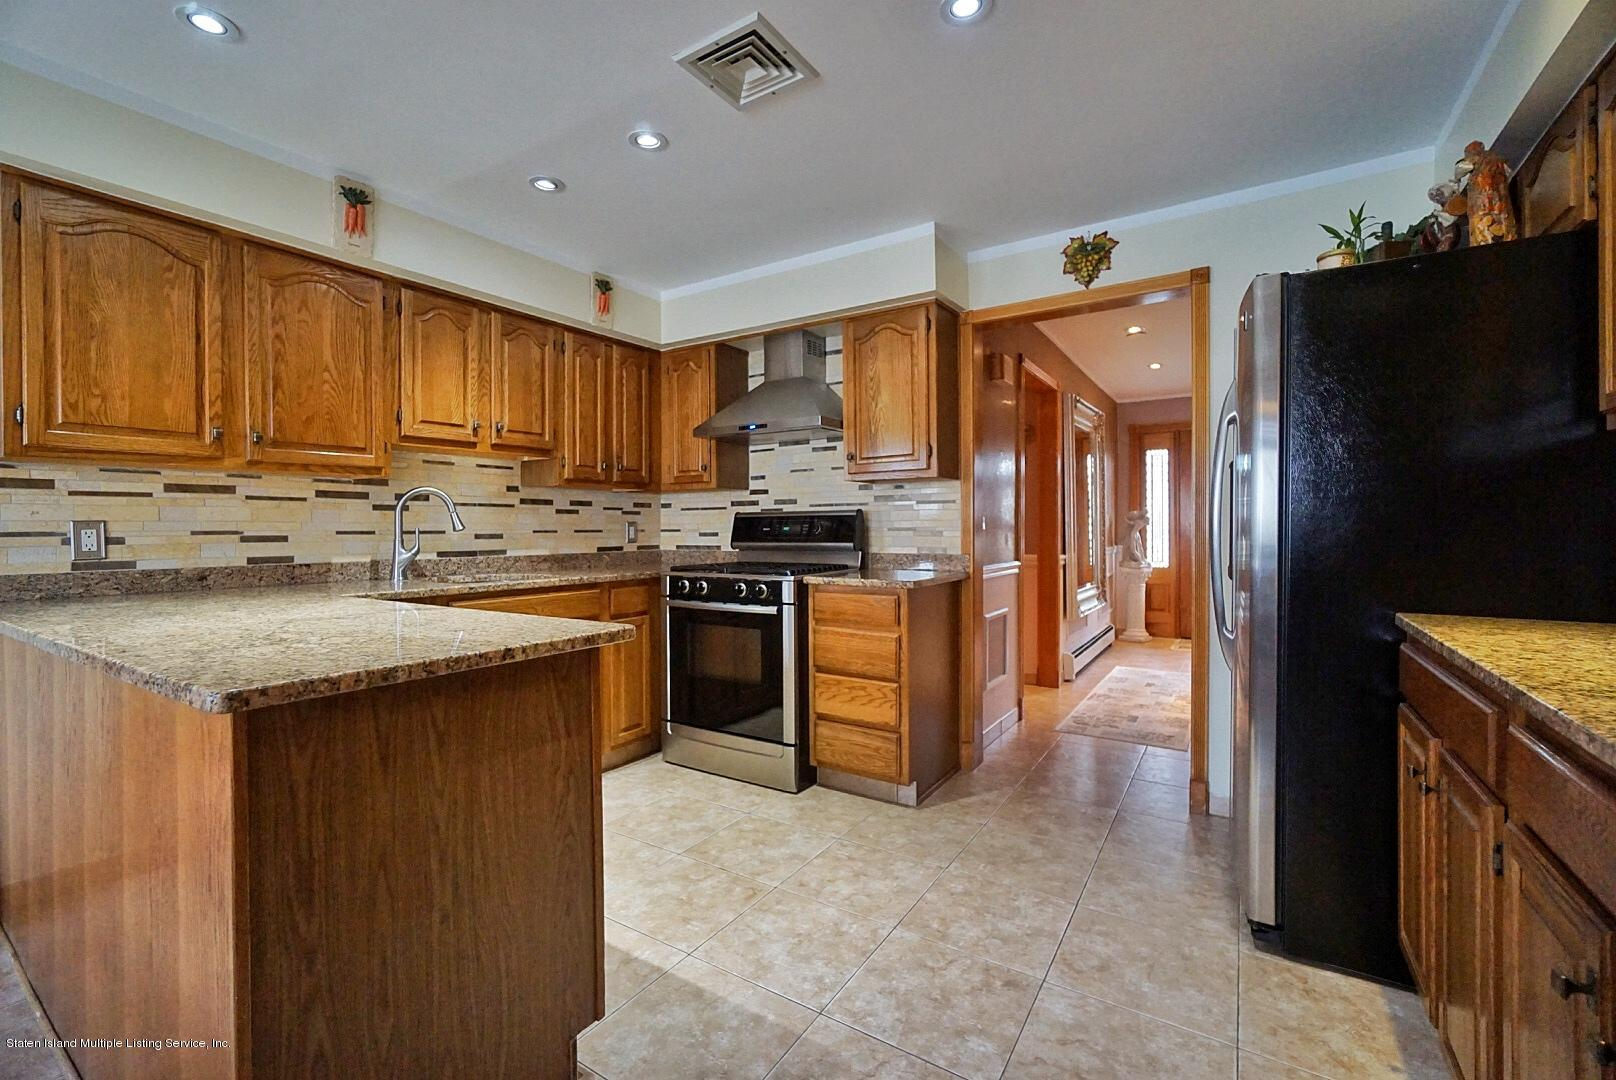 Two Family - Detached 360 Main Street  Staten Island, NY 10307, MLS-1124744-12